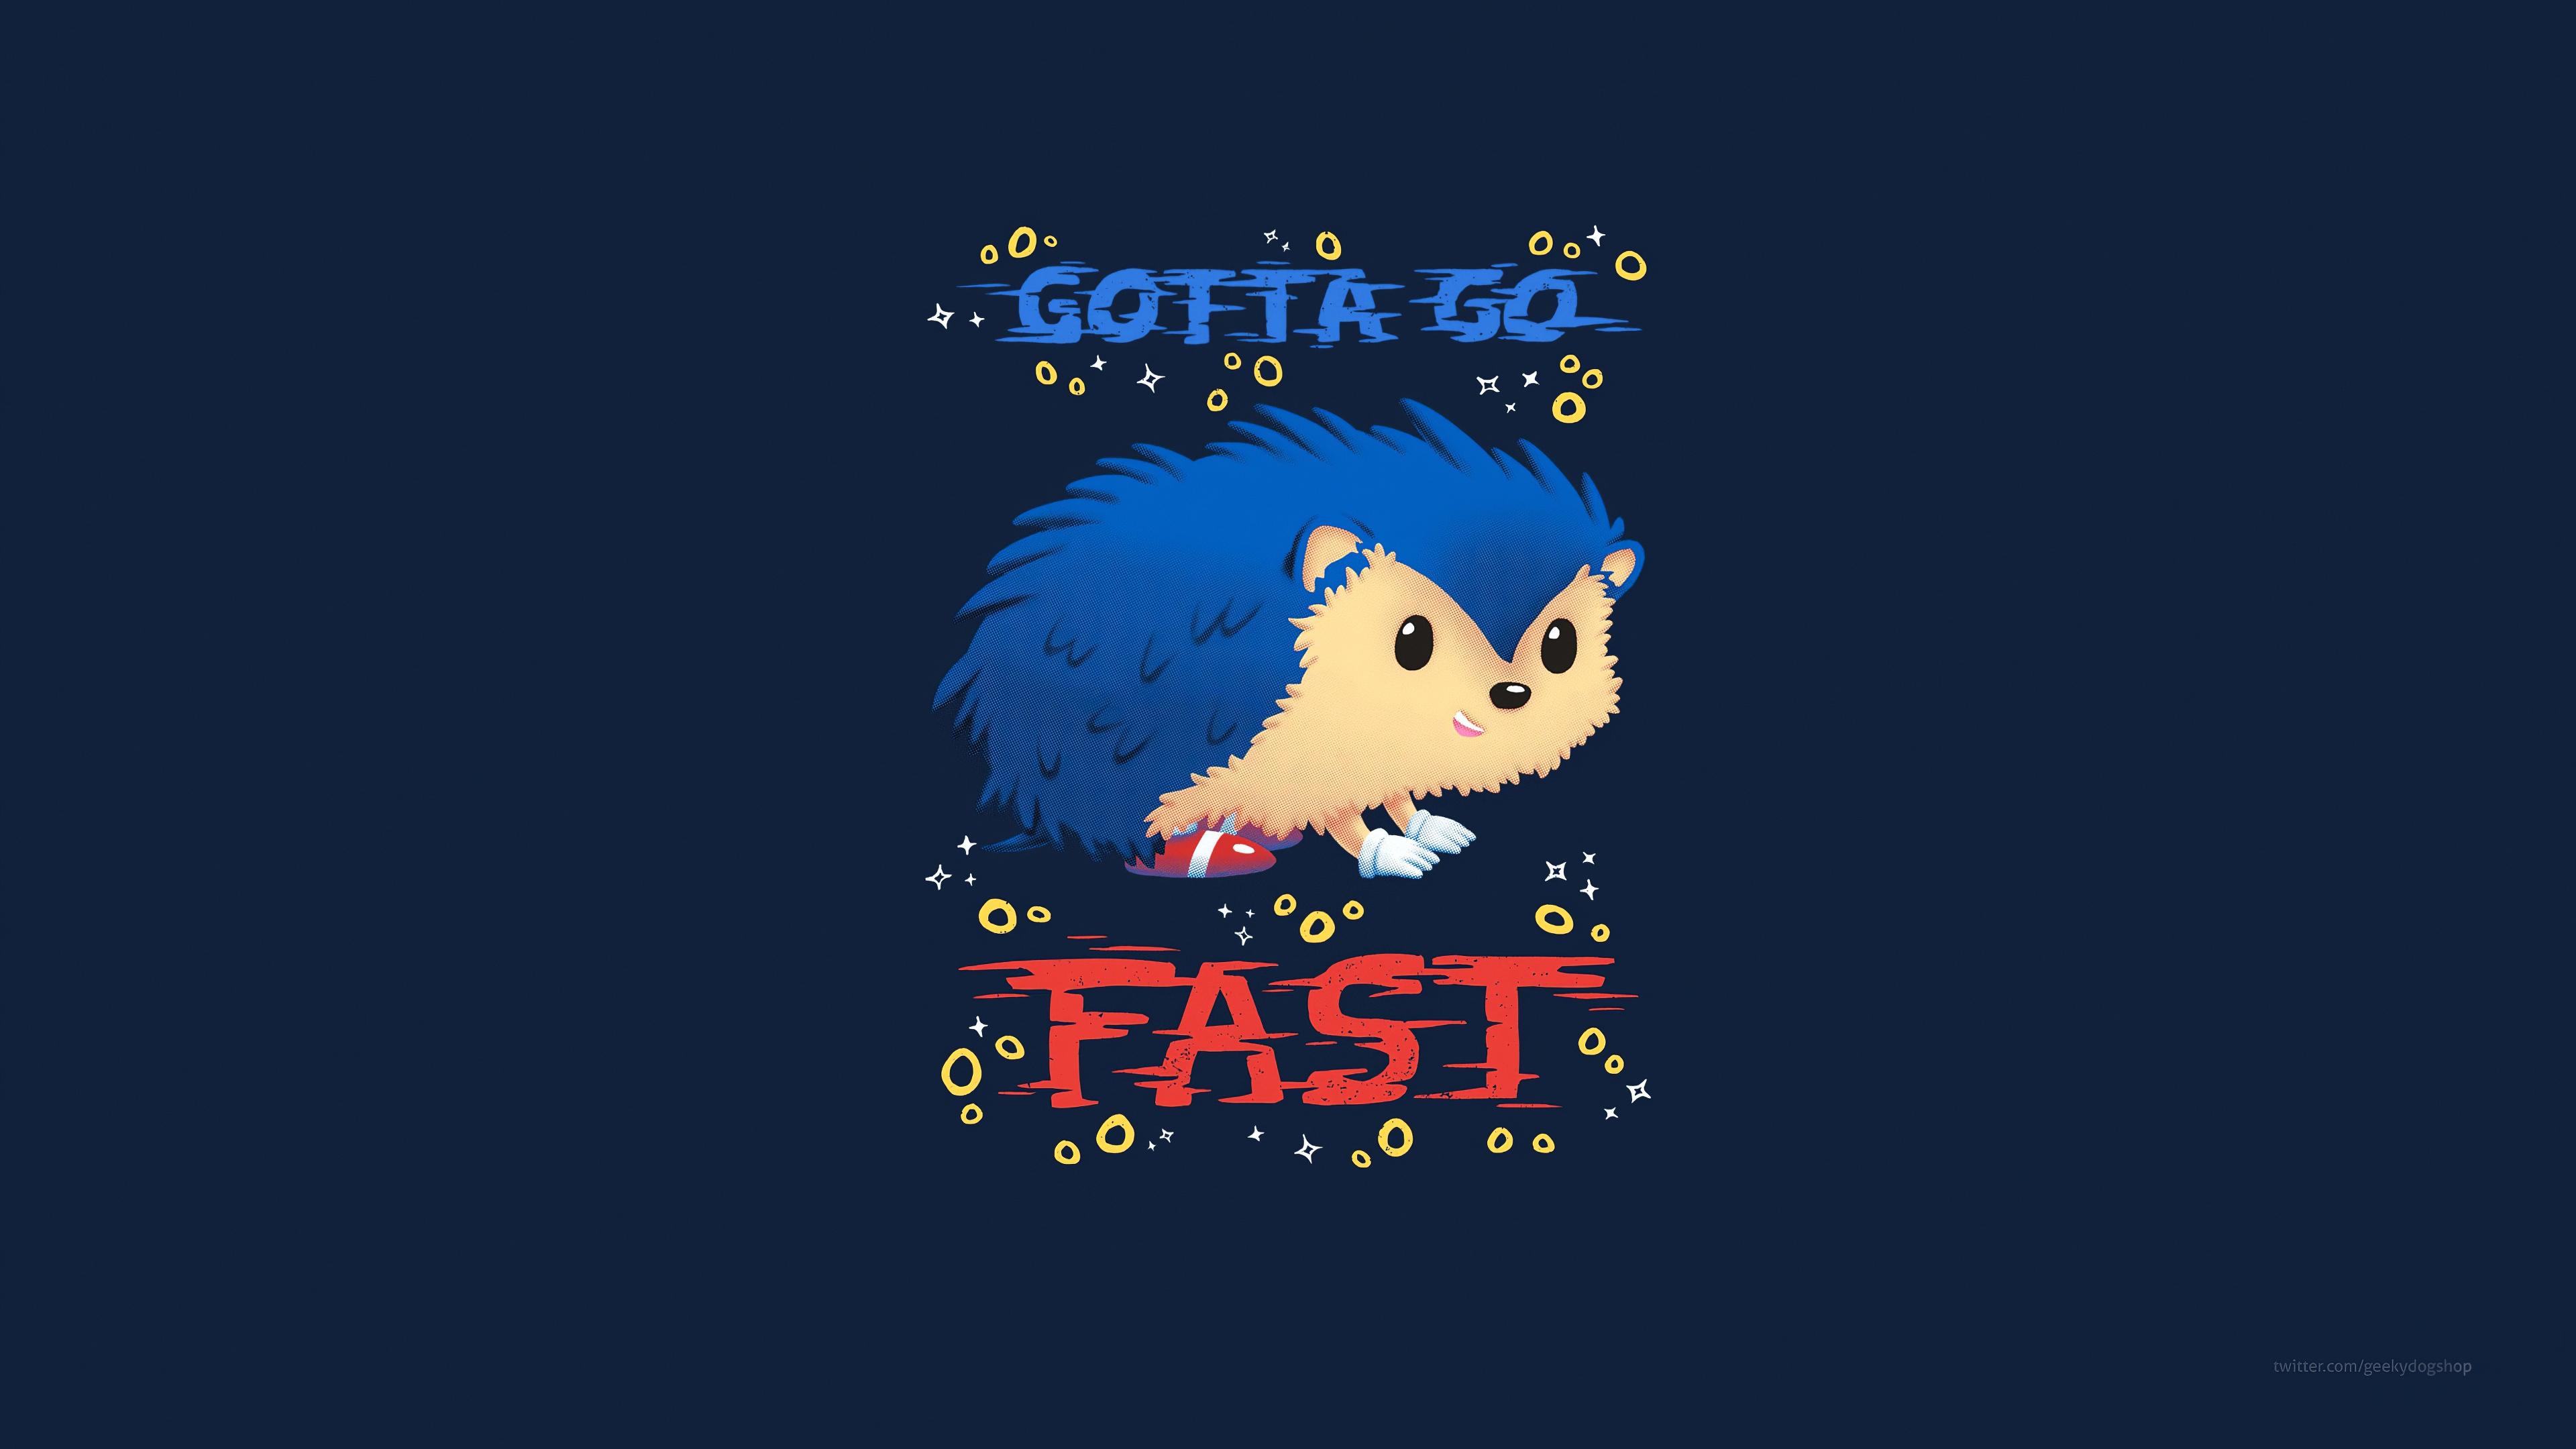 sonic the hedgehog minimal art 1579648189 - Sonic The Hedgehog Minimal Art - Sonic The Hedgehog Minimal Art wallpaper 4k